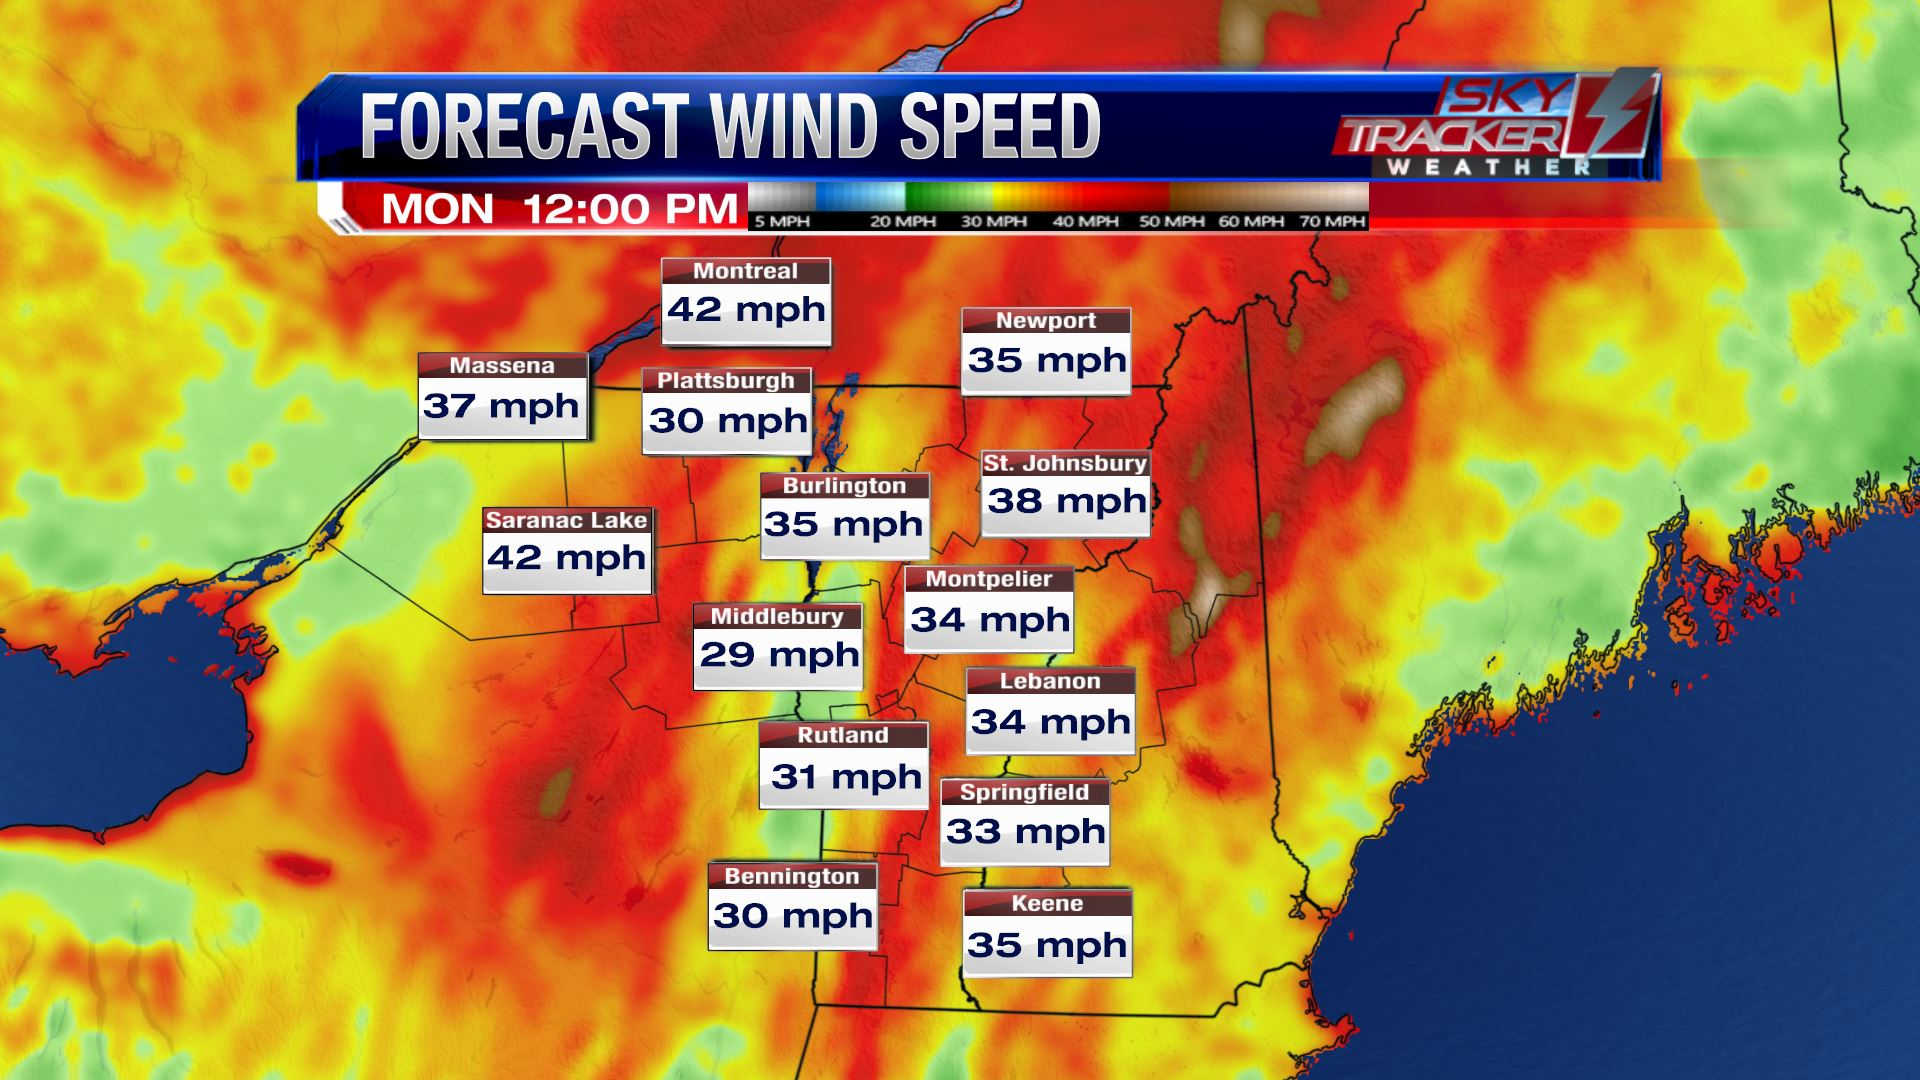 Forecast Wind Speed 1_1551046011298.JPG.jpg